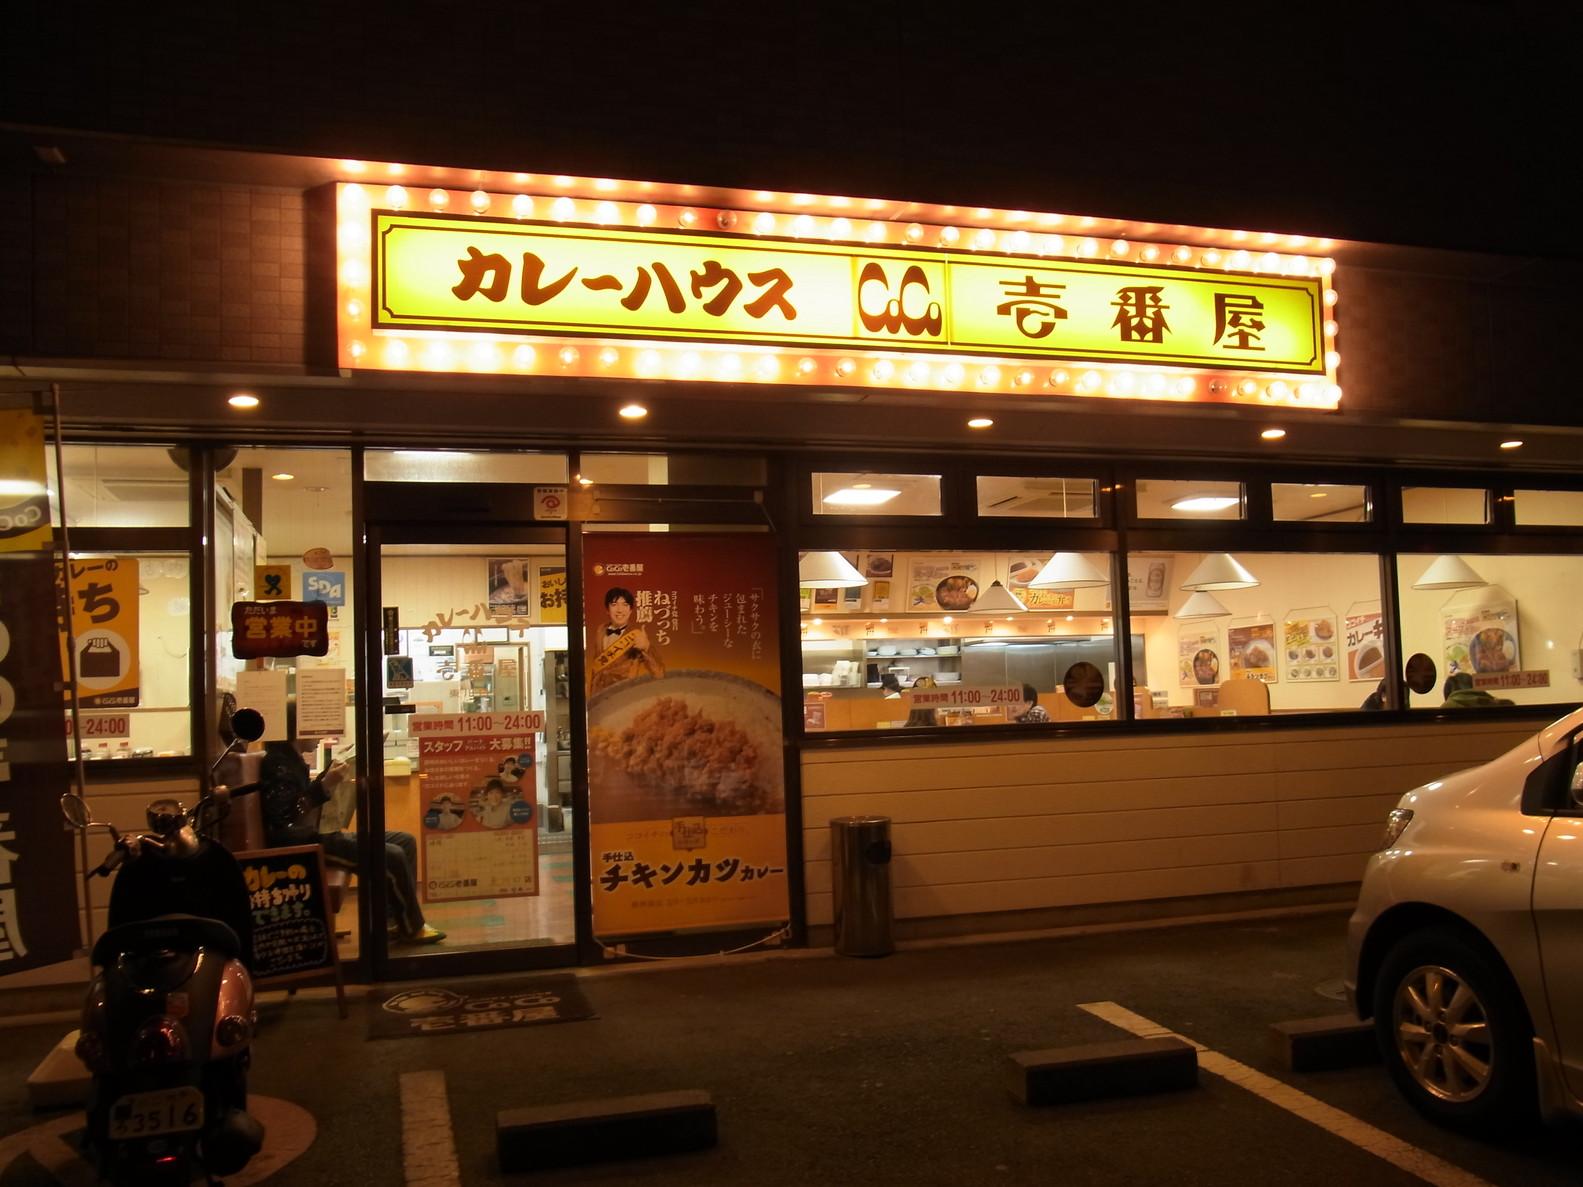 CoCo壱番屋 東川口店